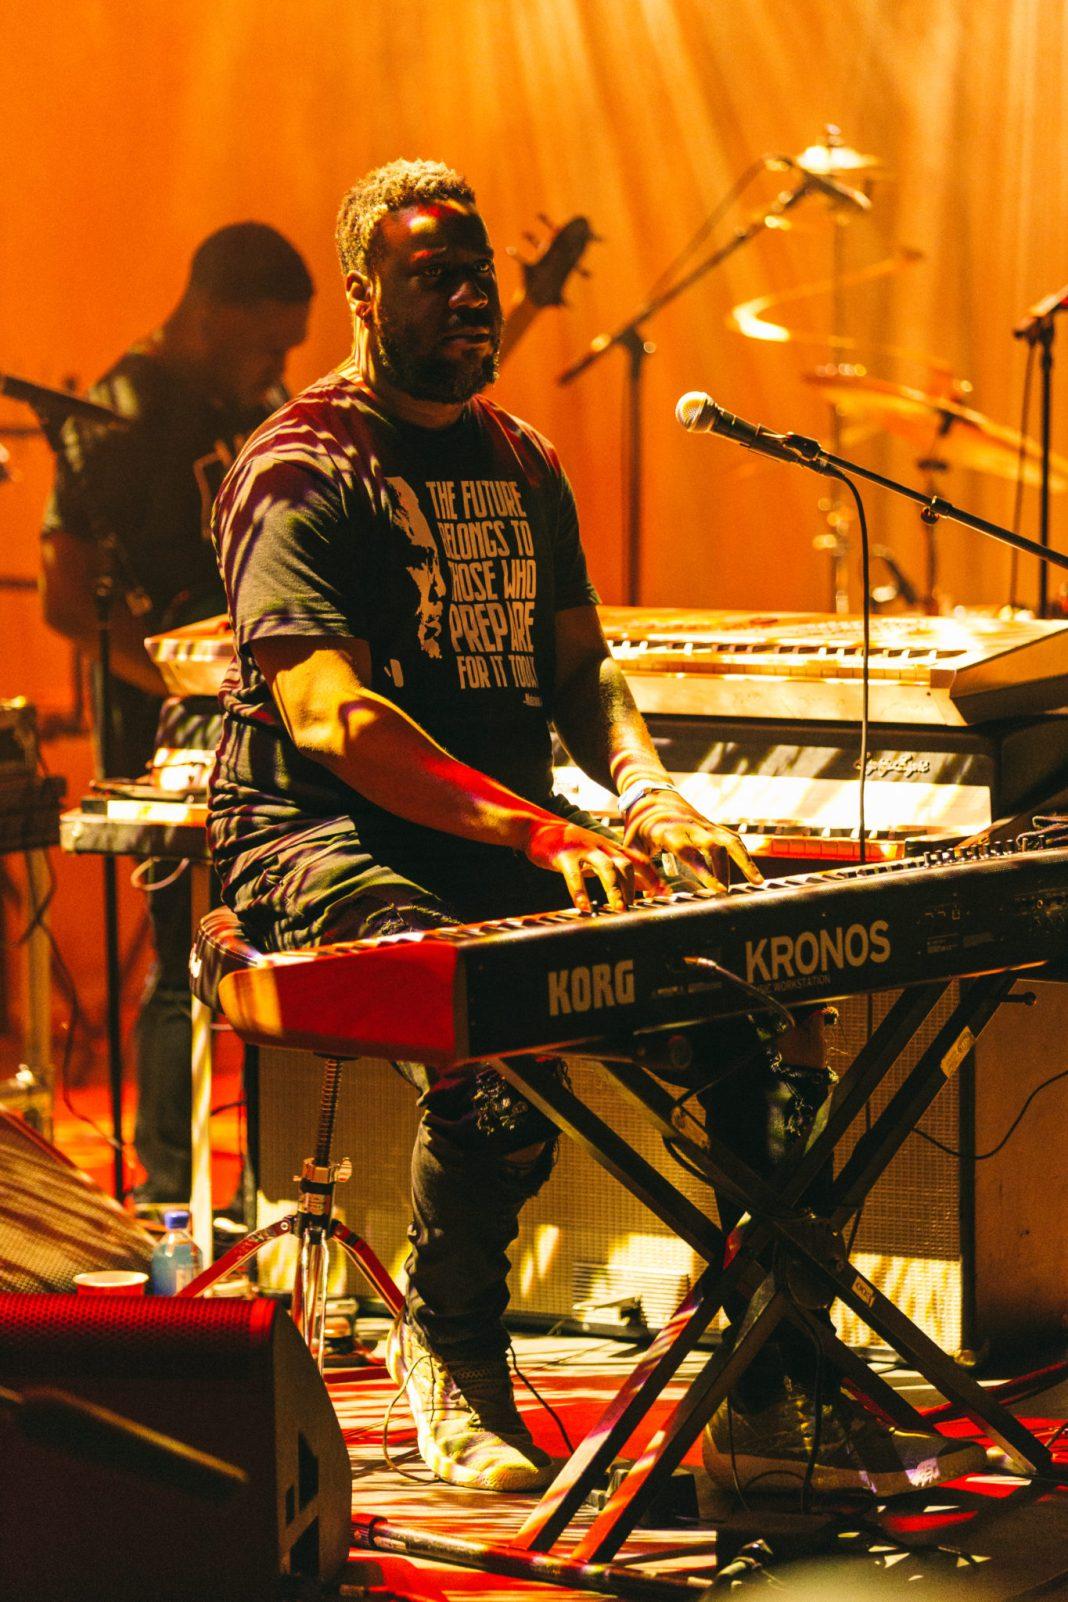 FORM arcosanti music festival live music blog justin yee 2019 arts culture photography